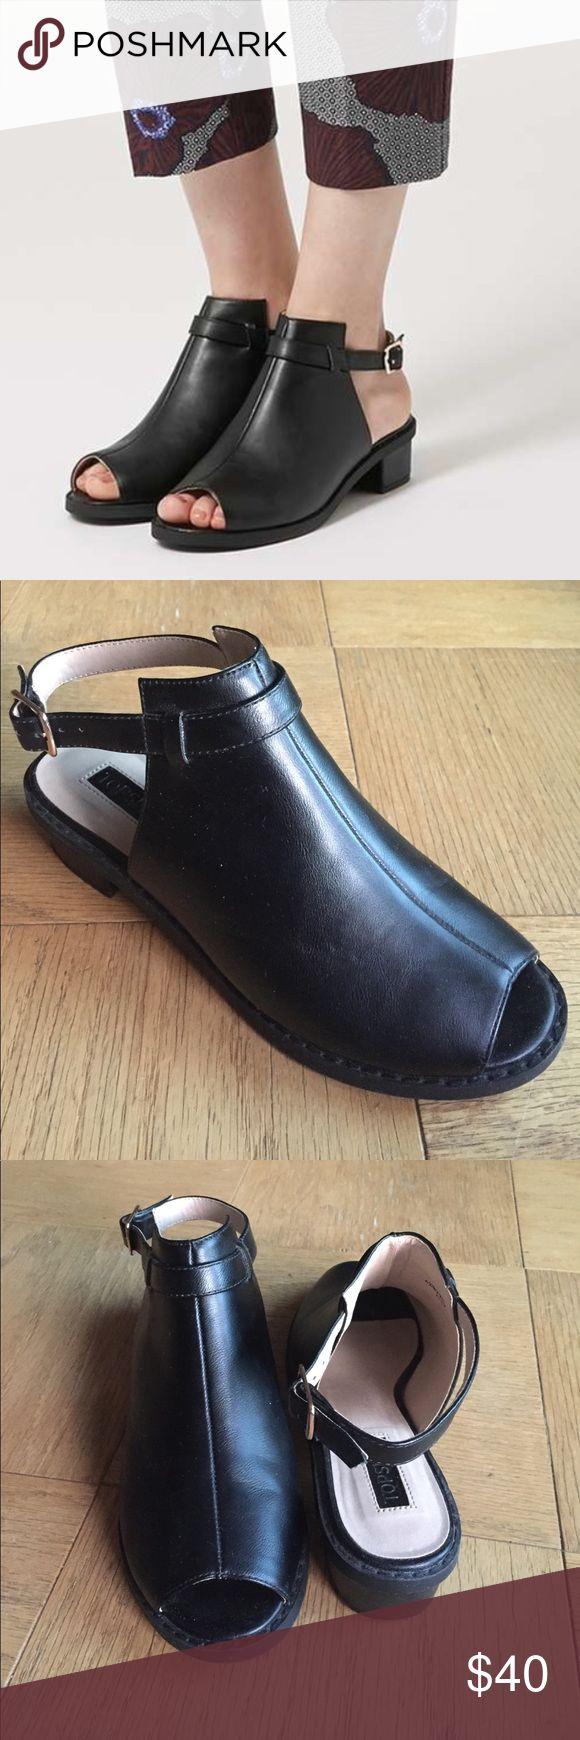 Black jelly sandals topshop - Topshop Black Sandals